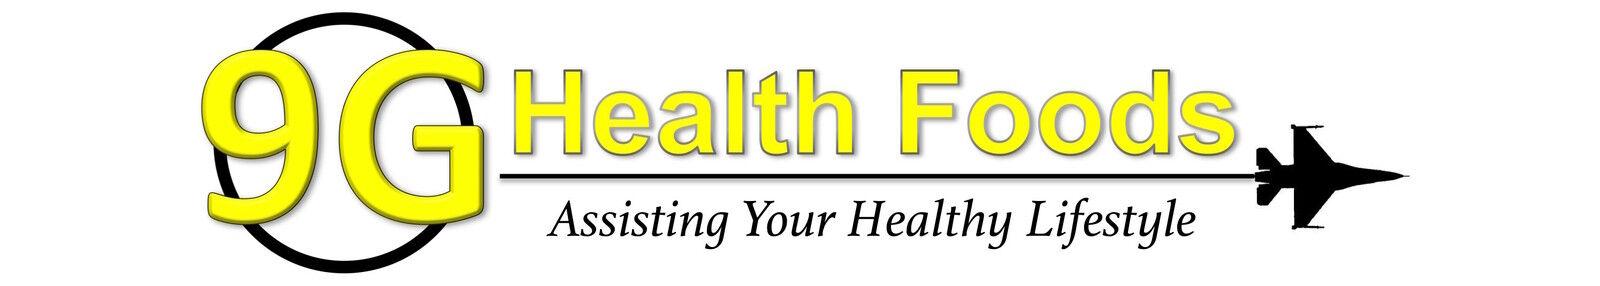 9G Health Foods